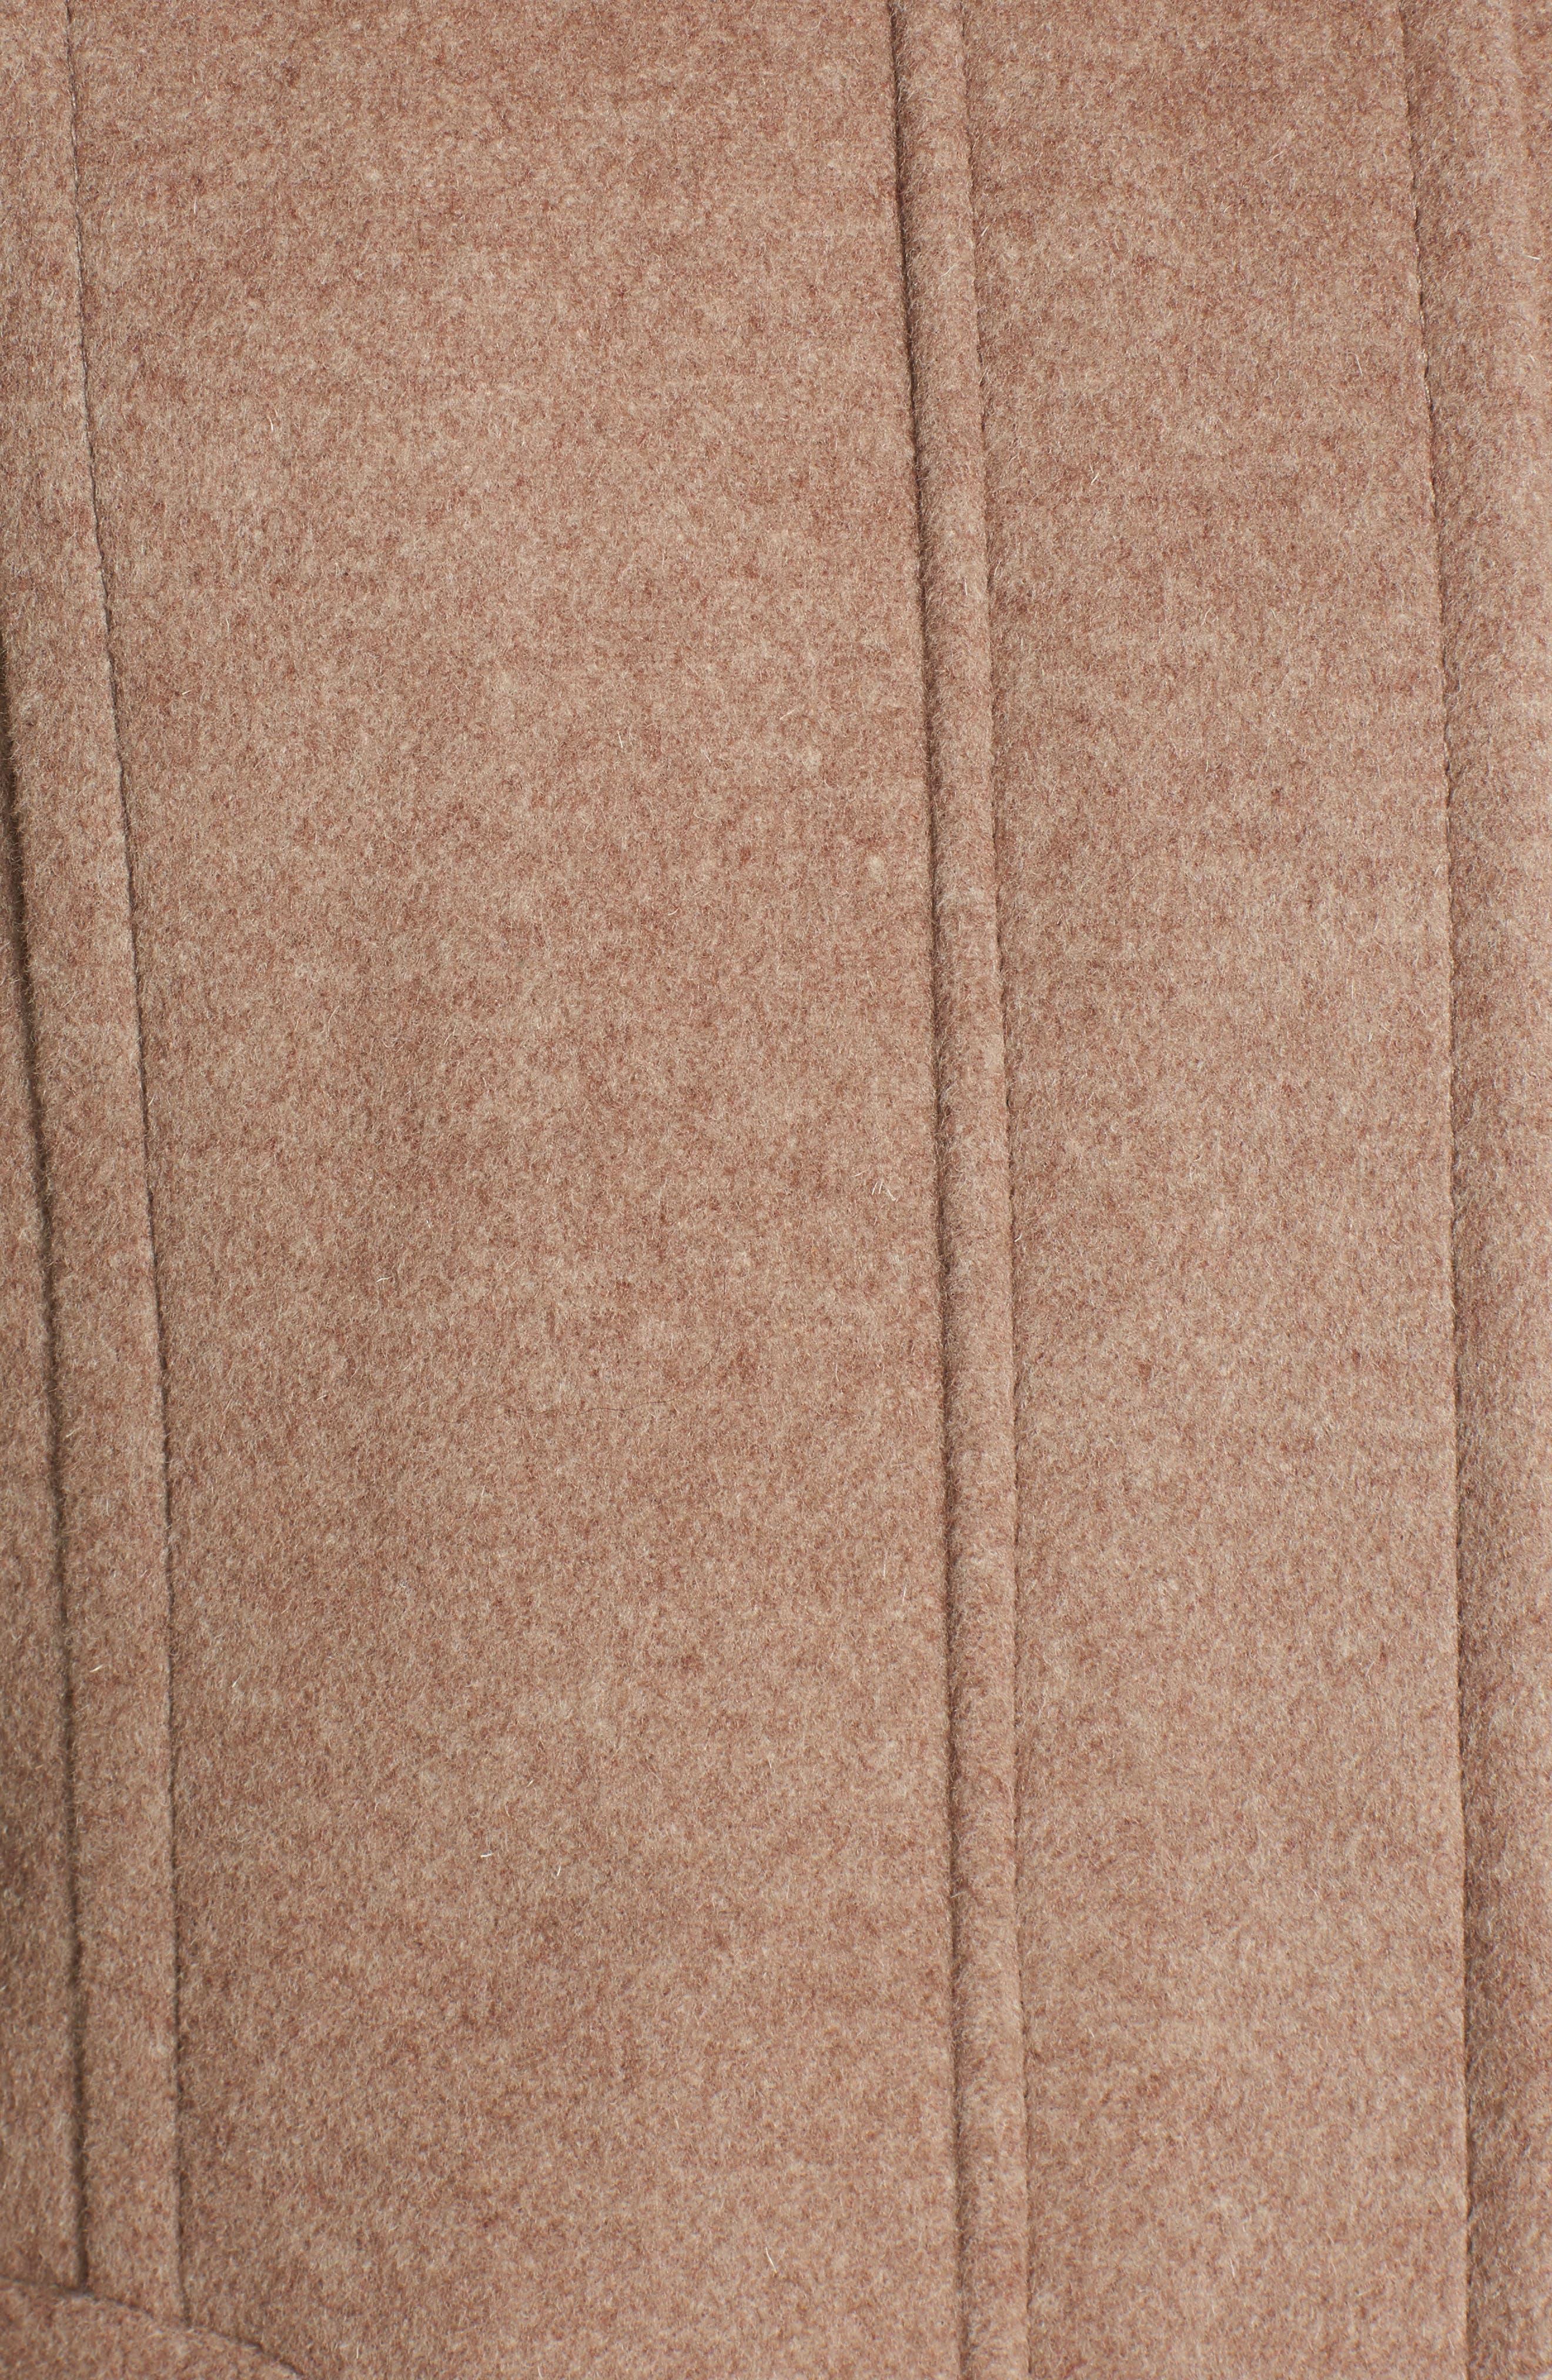 Hooded Wool Blend Coat with Genuine Fox Fur Trim,                             Alternate thumbnail 17, color,